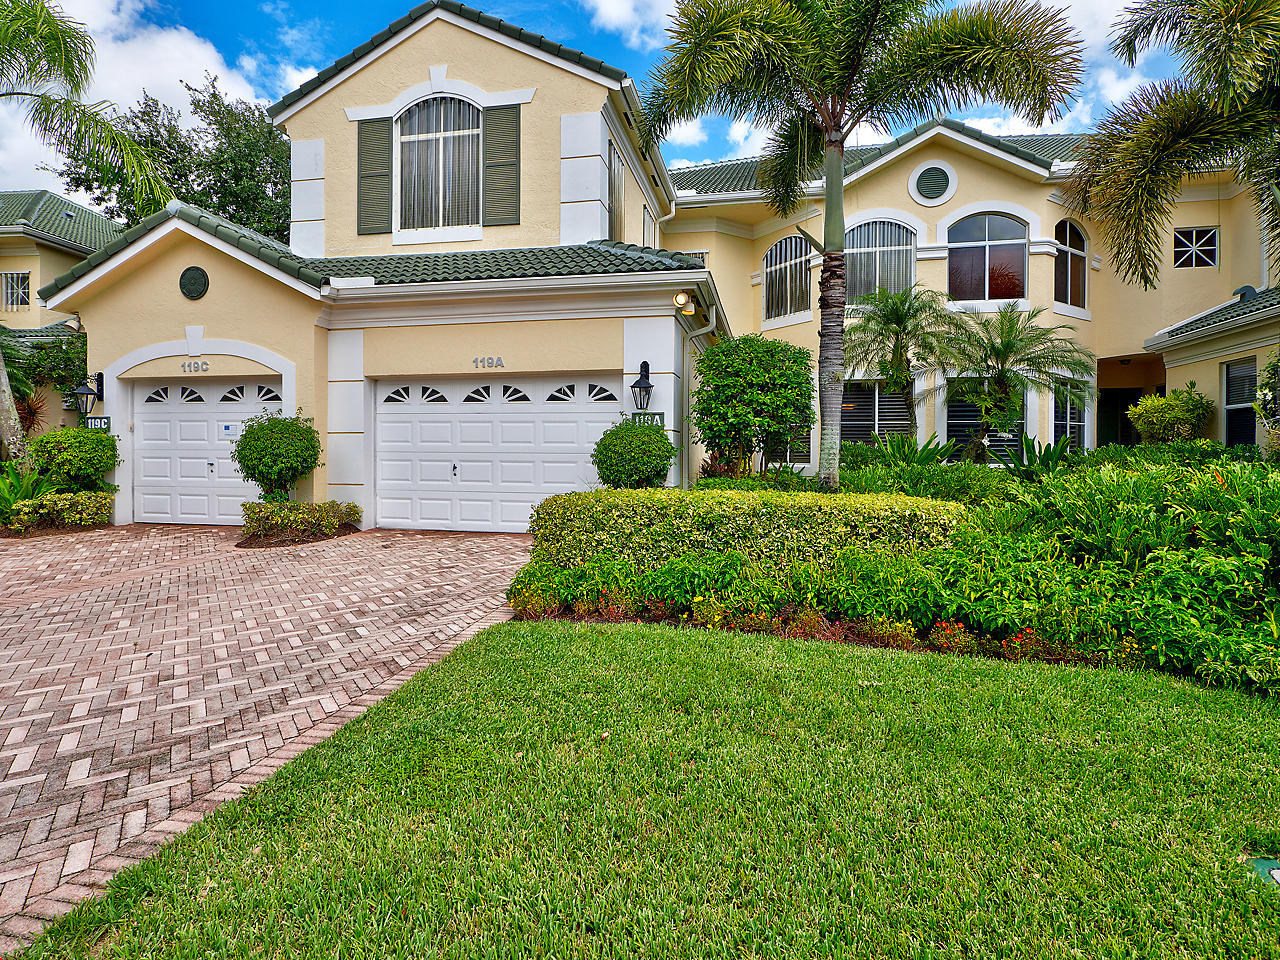 119 Palm Point Circle A, Palm Beach Gardens, Florida 33418, 2 Bedrooms Bedrooms, ,2.1 BathroomsBathrooms,A,Condominium,Palm Point,RX-10461177